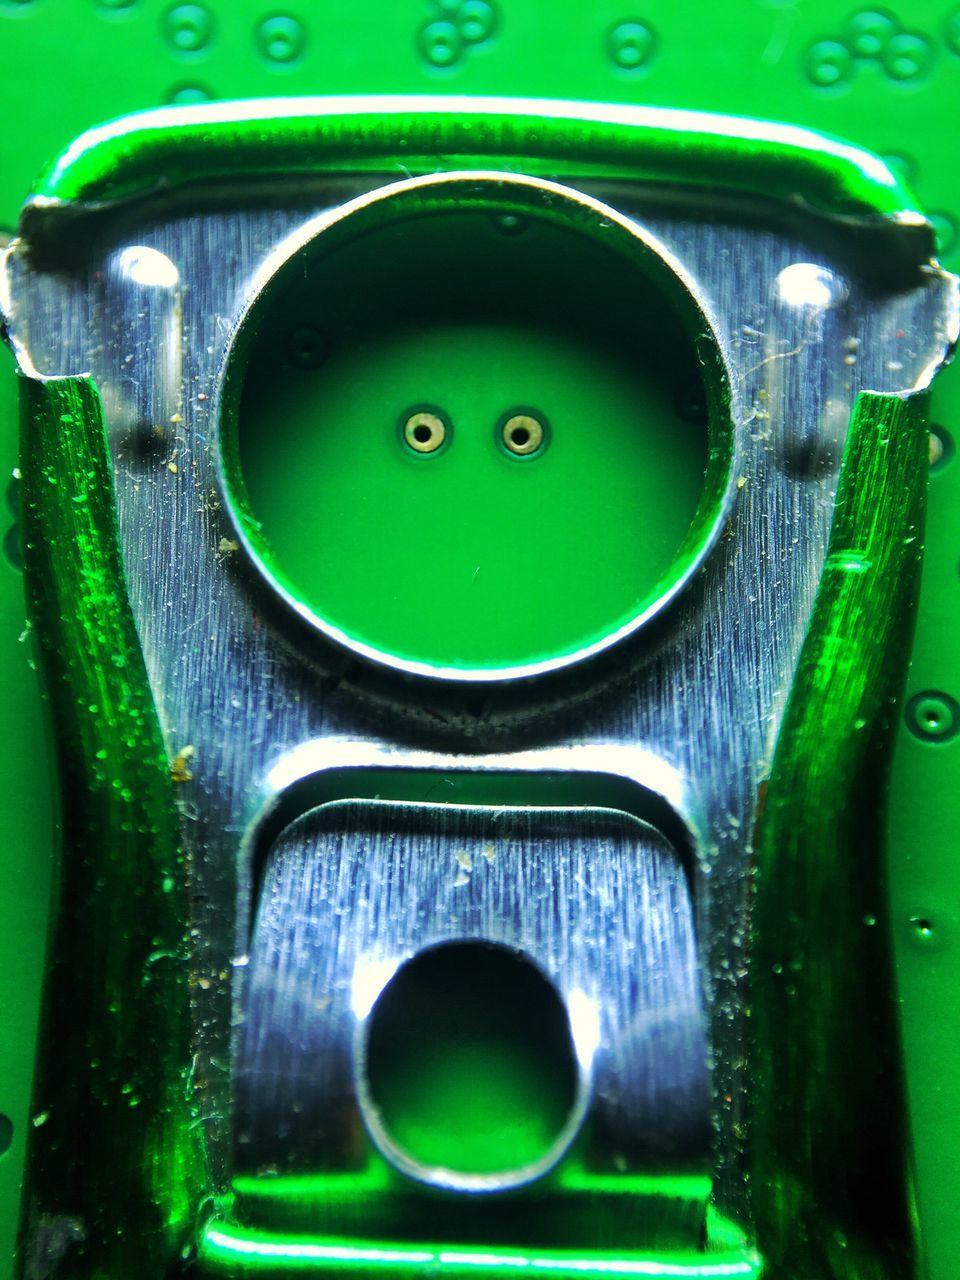 Close-Up Of Green Machinery